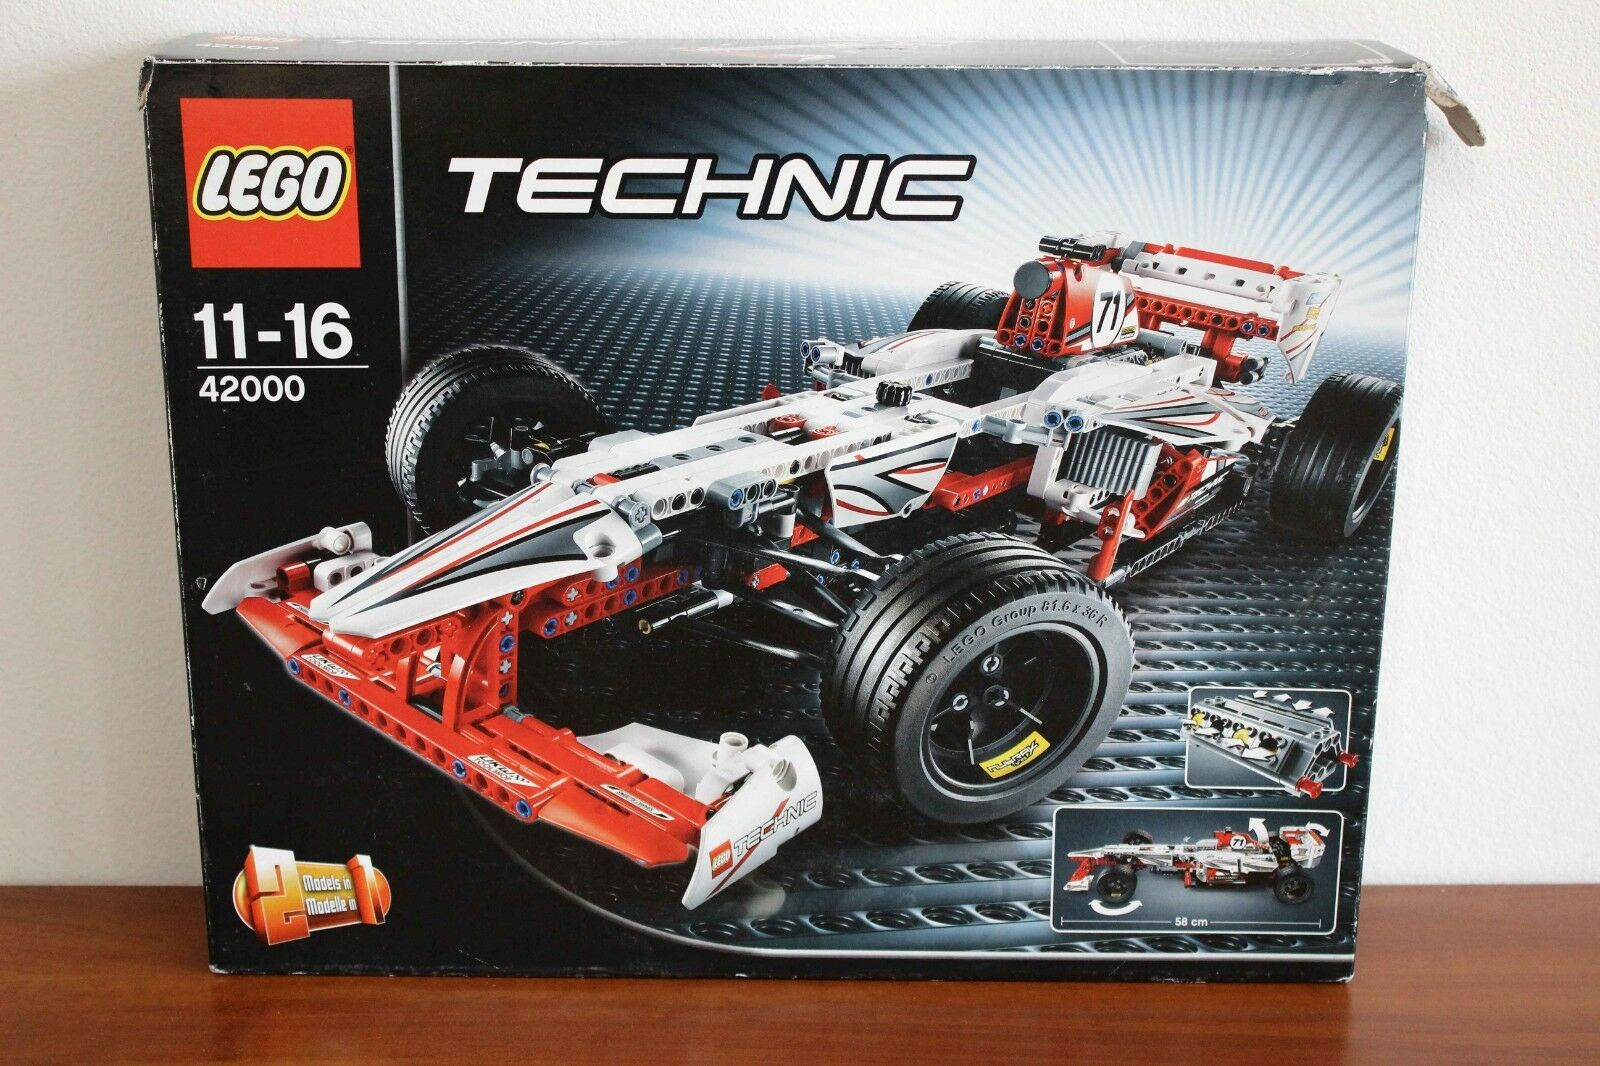 Lego Technic Model Race Set 42000-1 Grand Prix Race 100% complete + instr. + box